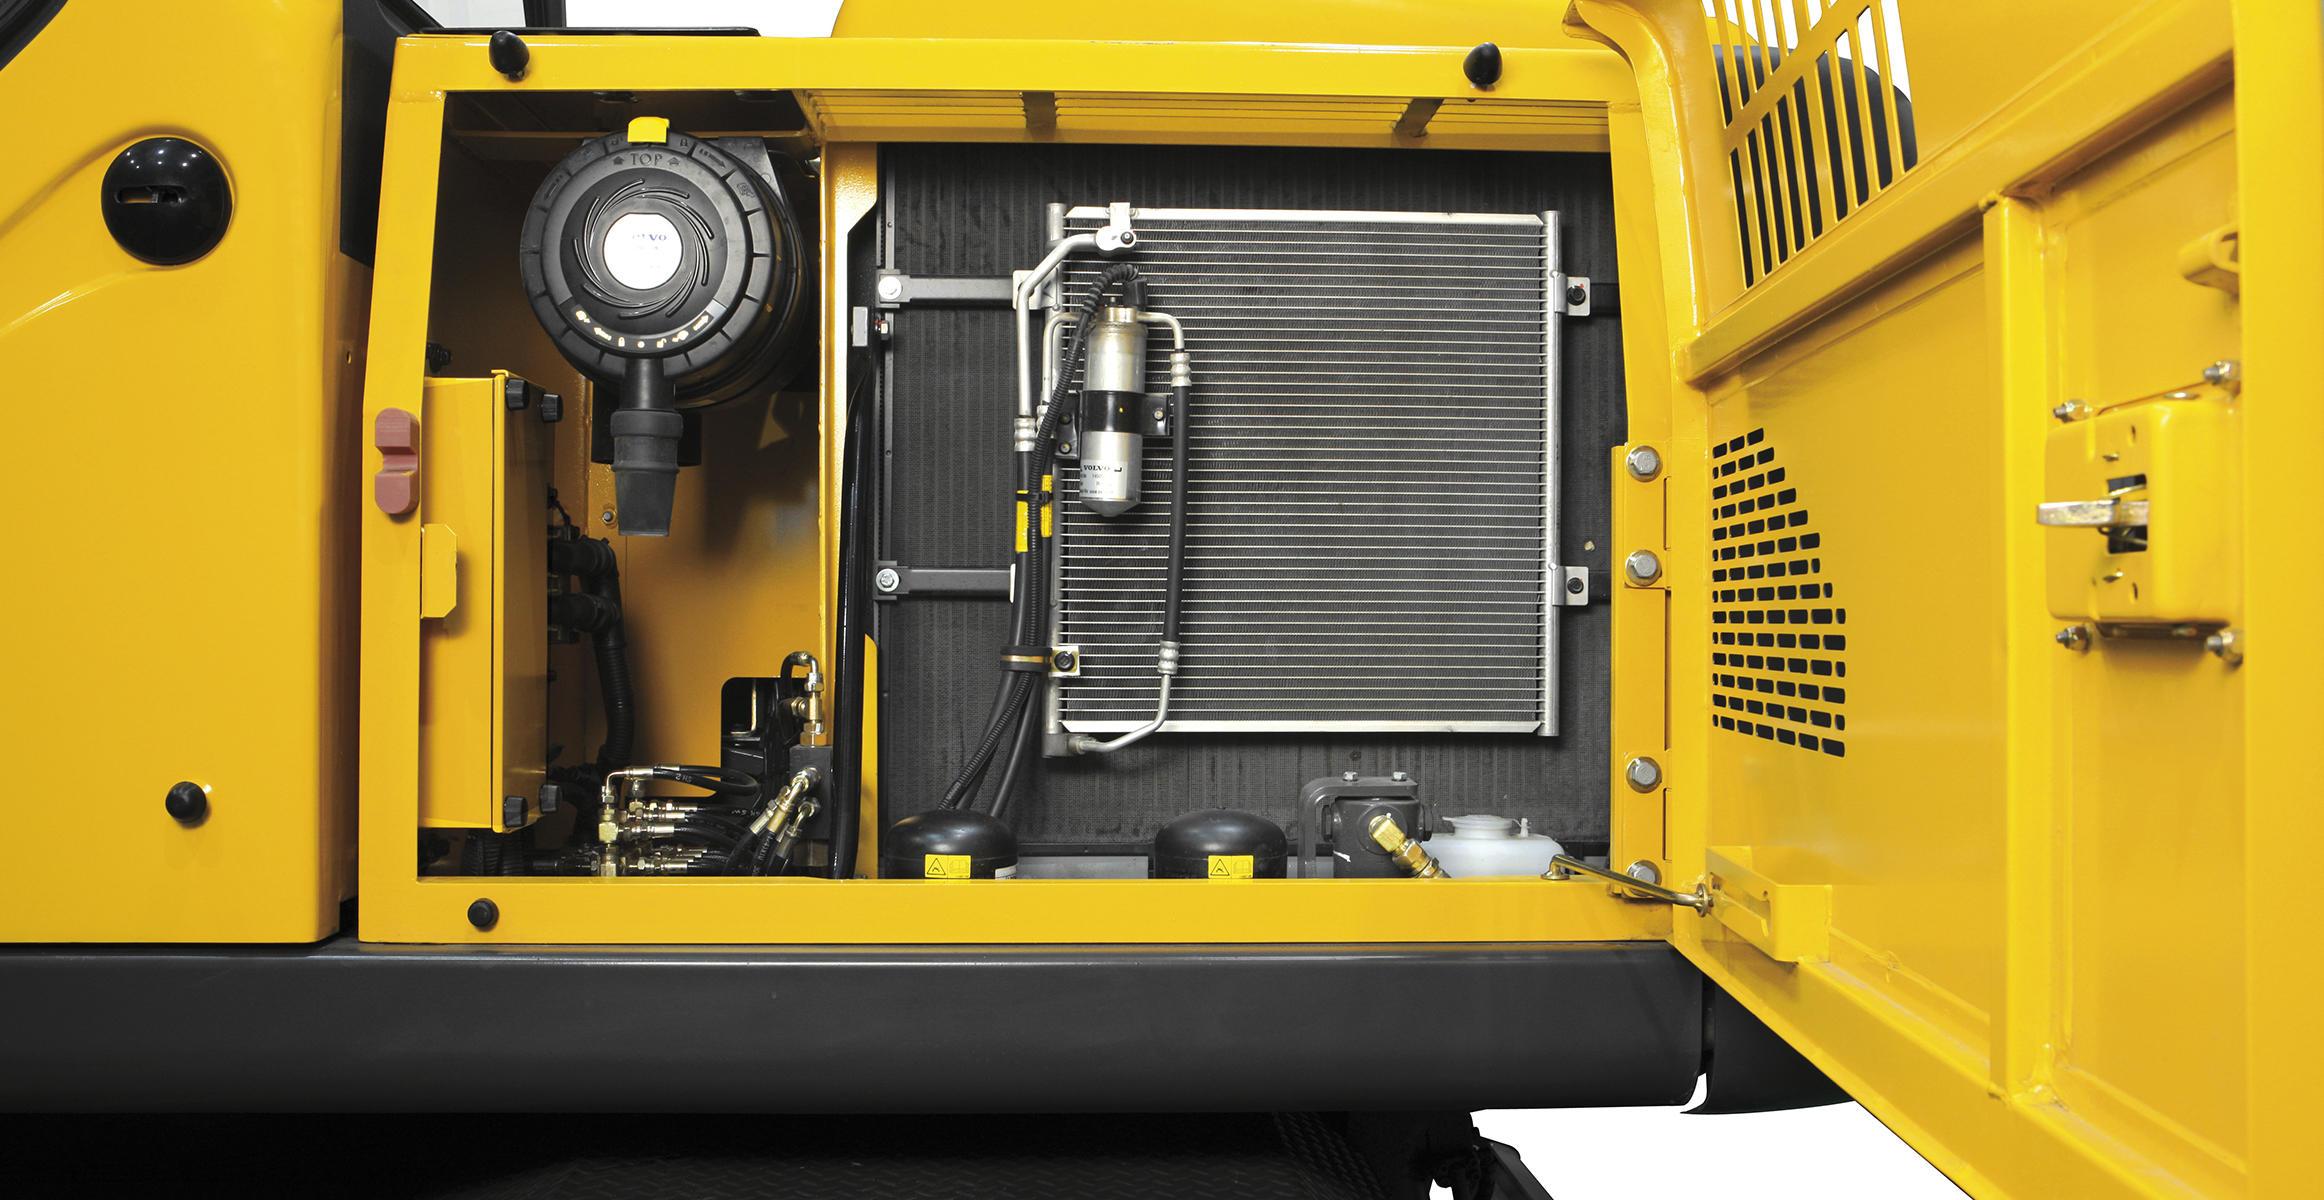 Ew145b Prime Wheeled Excavators Media Gallery Volvo Construction Equipment